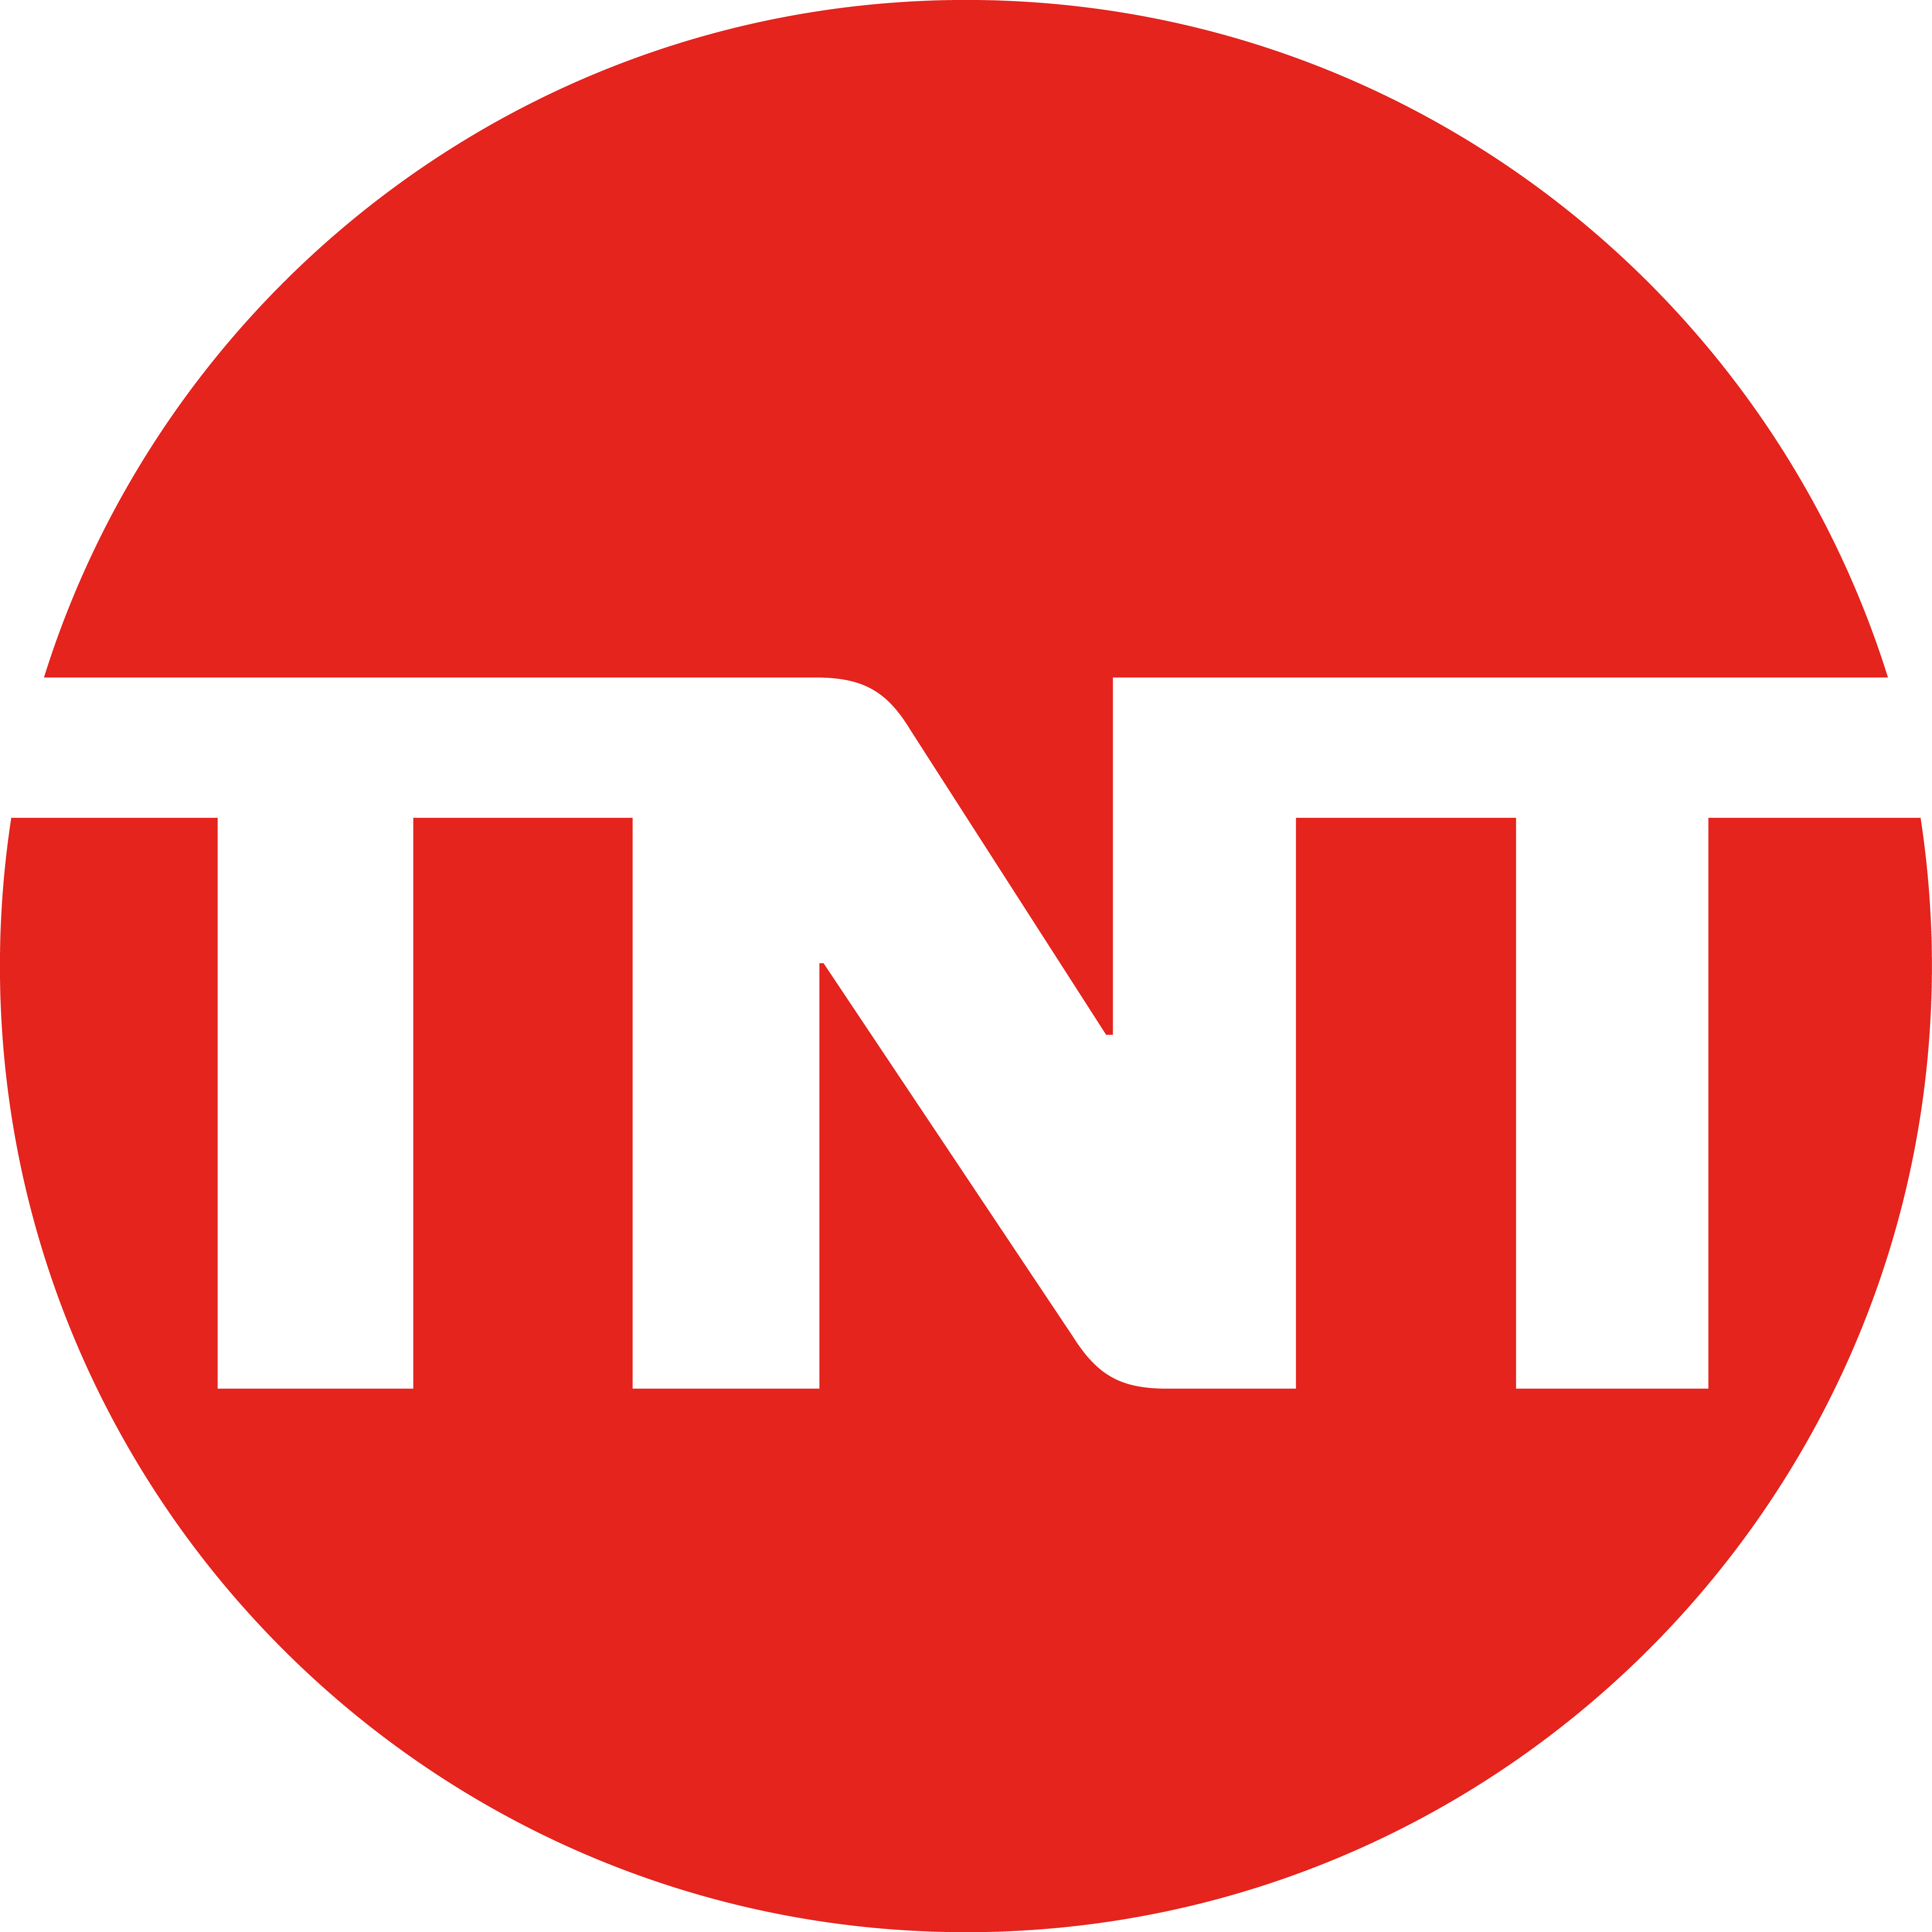 Filetnt Tv Romaniapng Wikimedia Commons